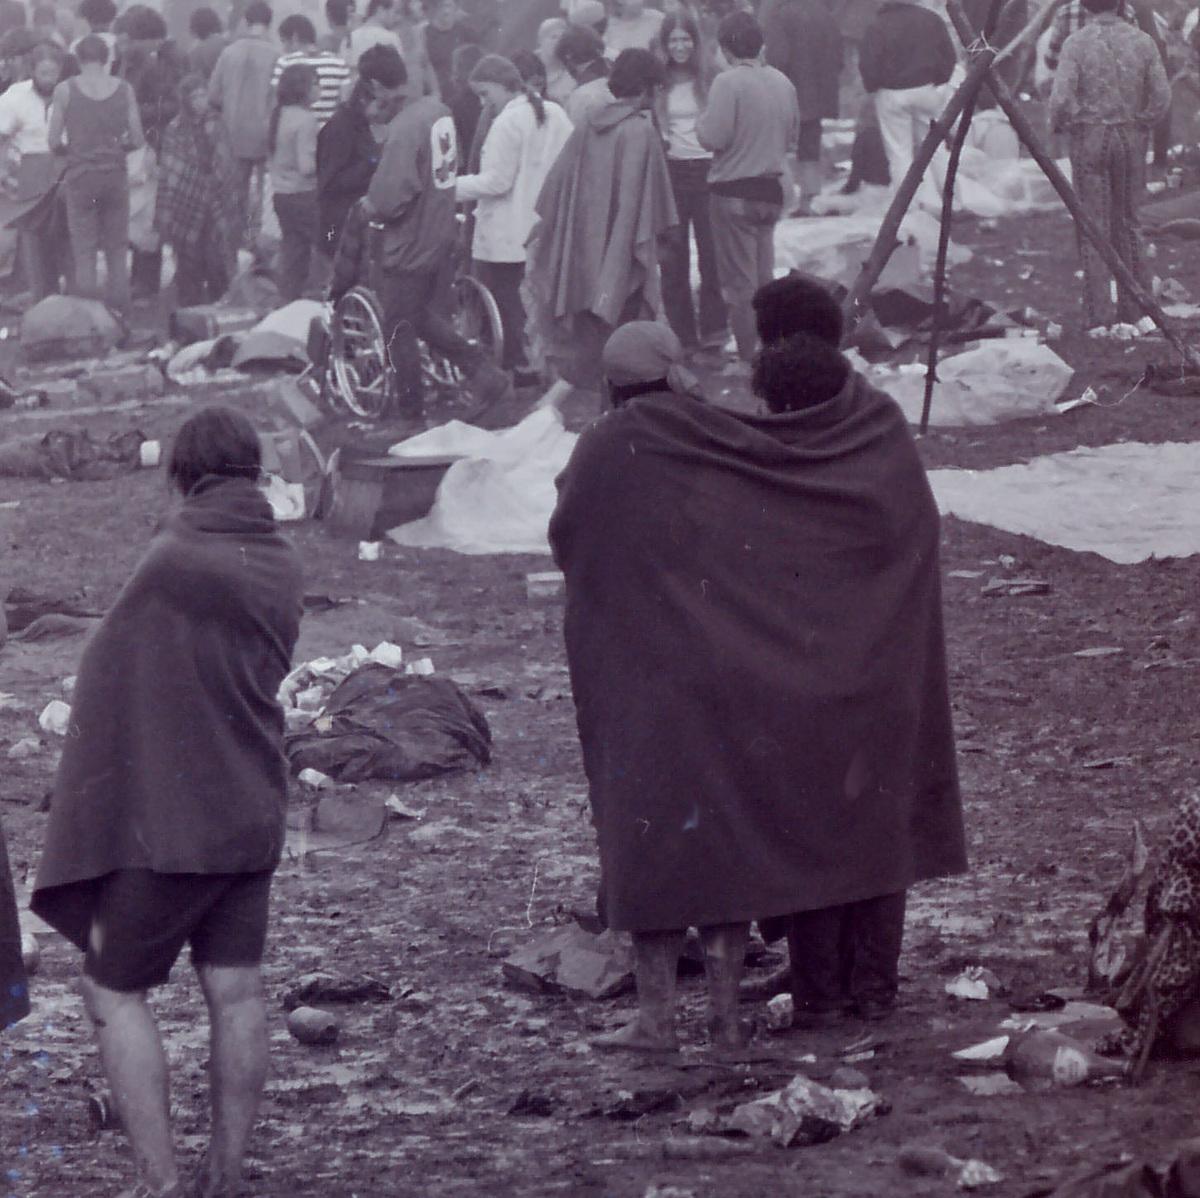 people enjoying woodstock in the rain and mud